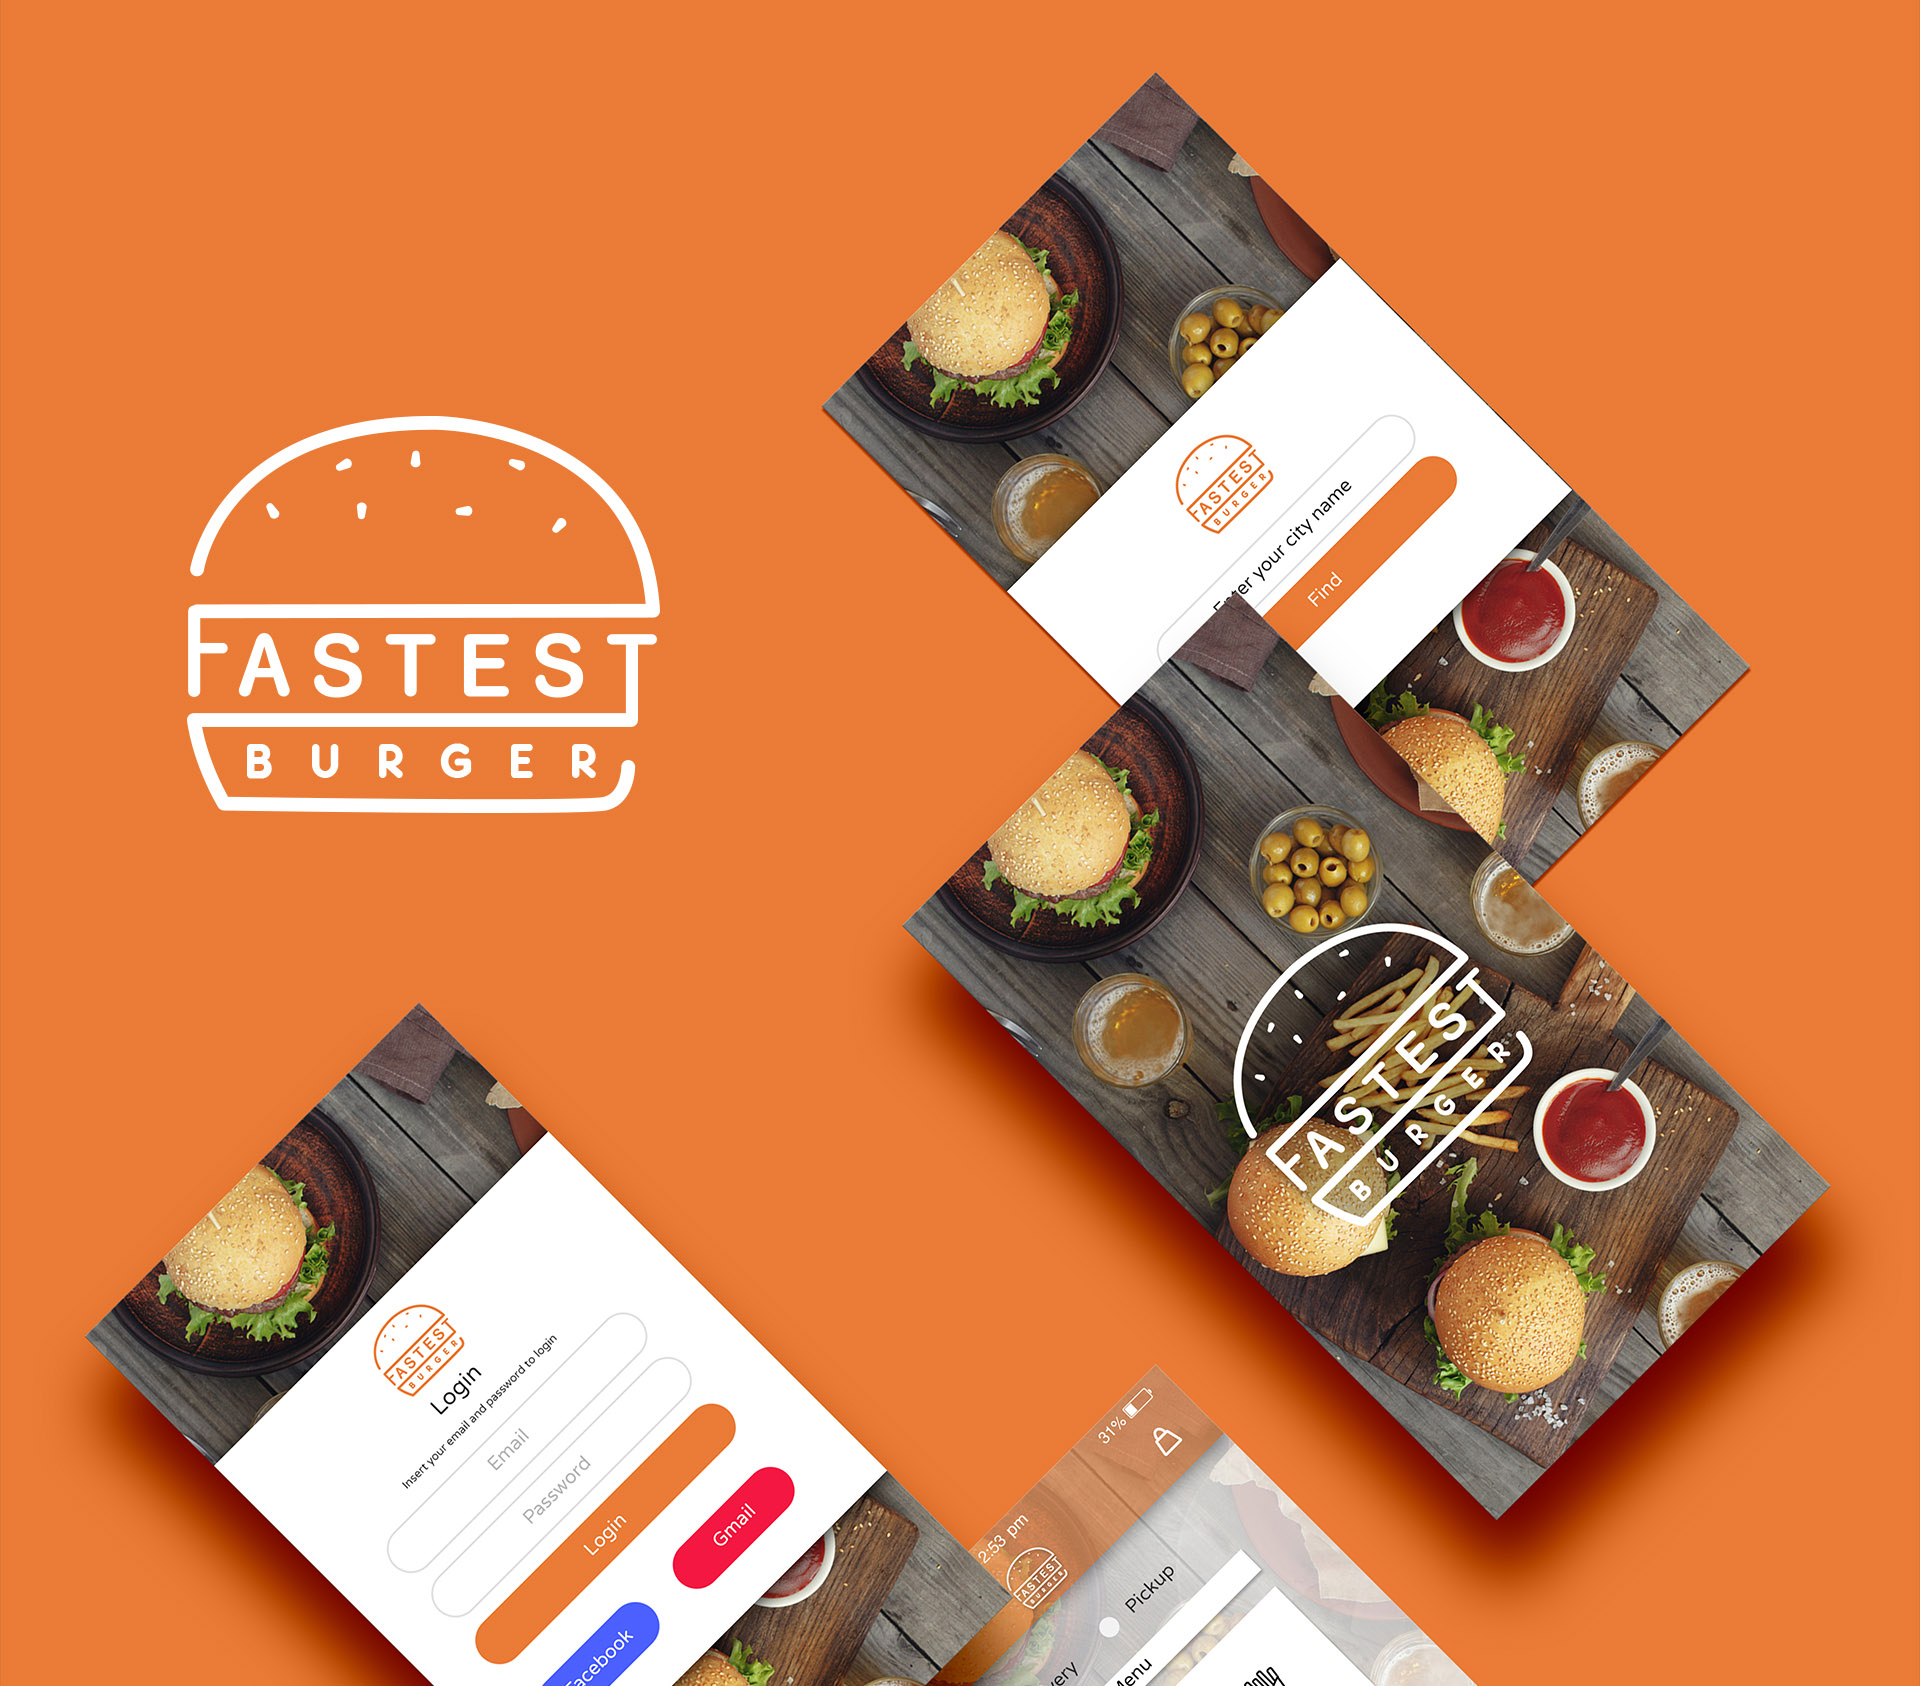 fast burger DGS